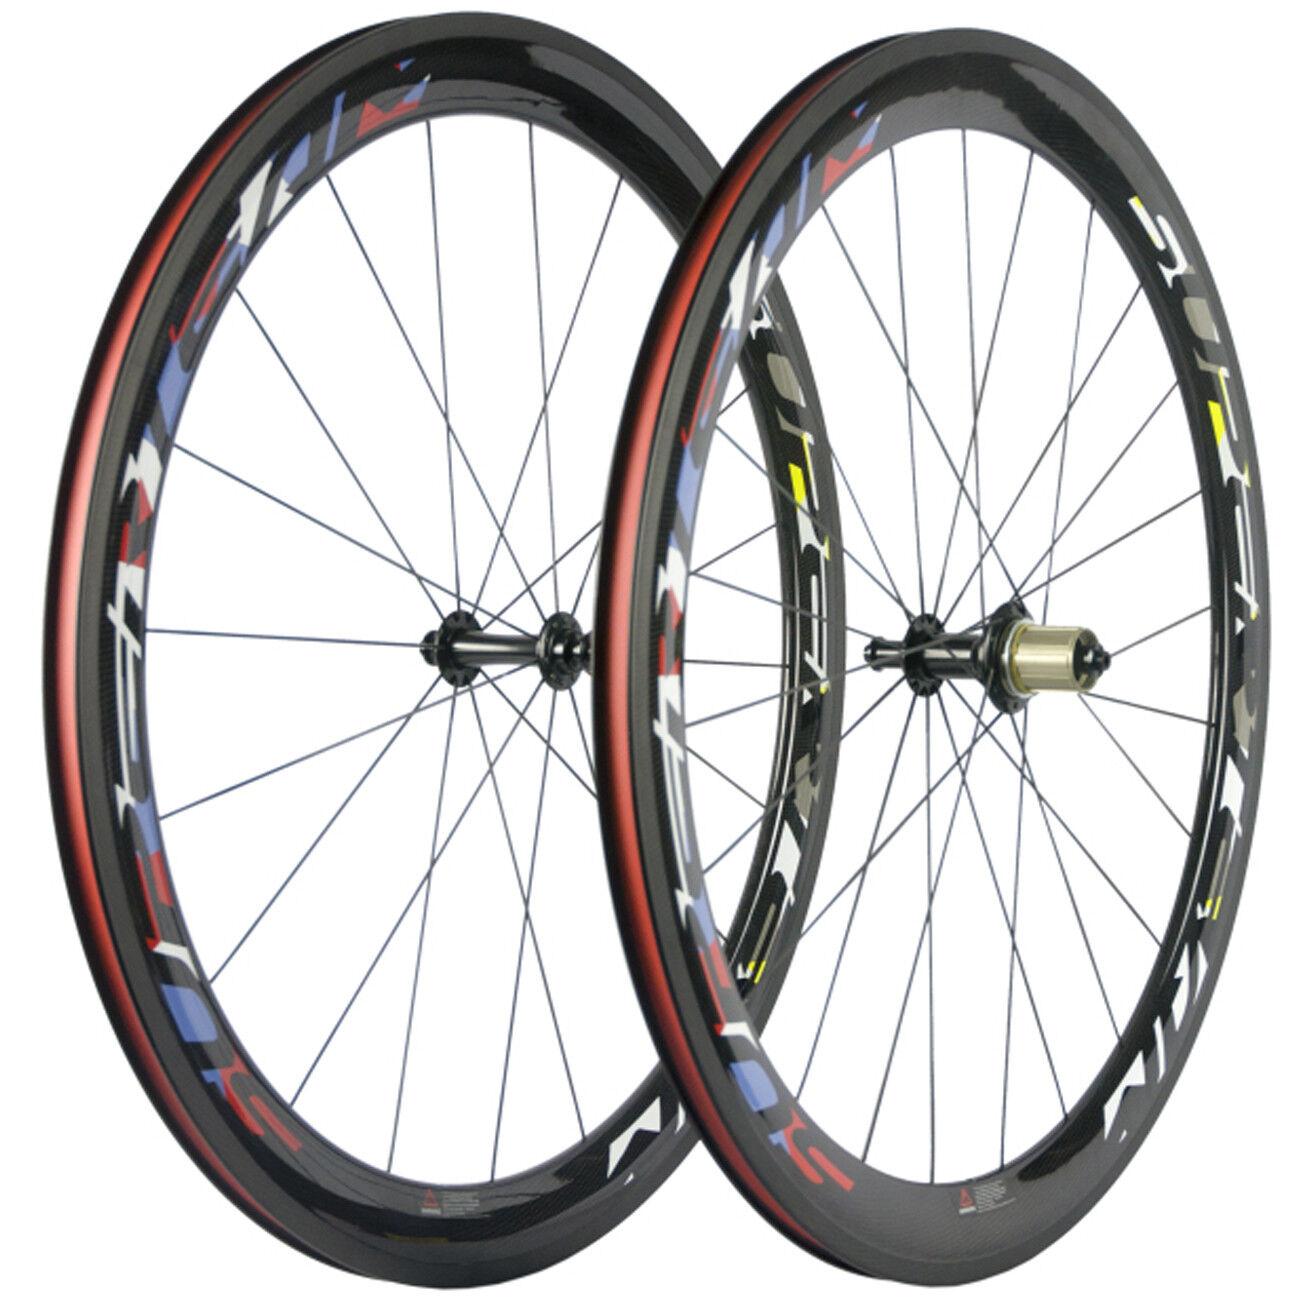 Superteam 700C HubSmith Ceramic Cycling Carbon Wheels 50mm Clincher Carbon Wheel